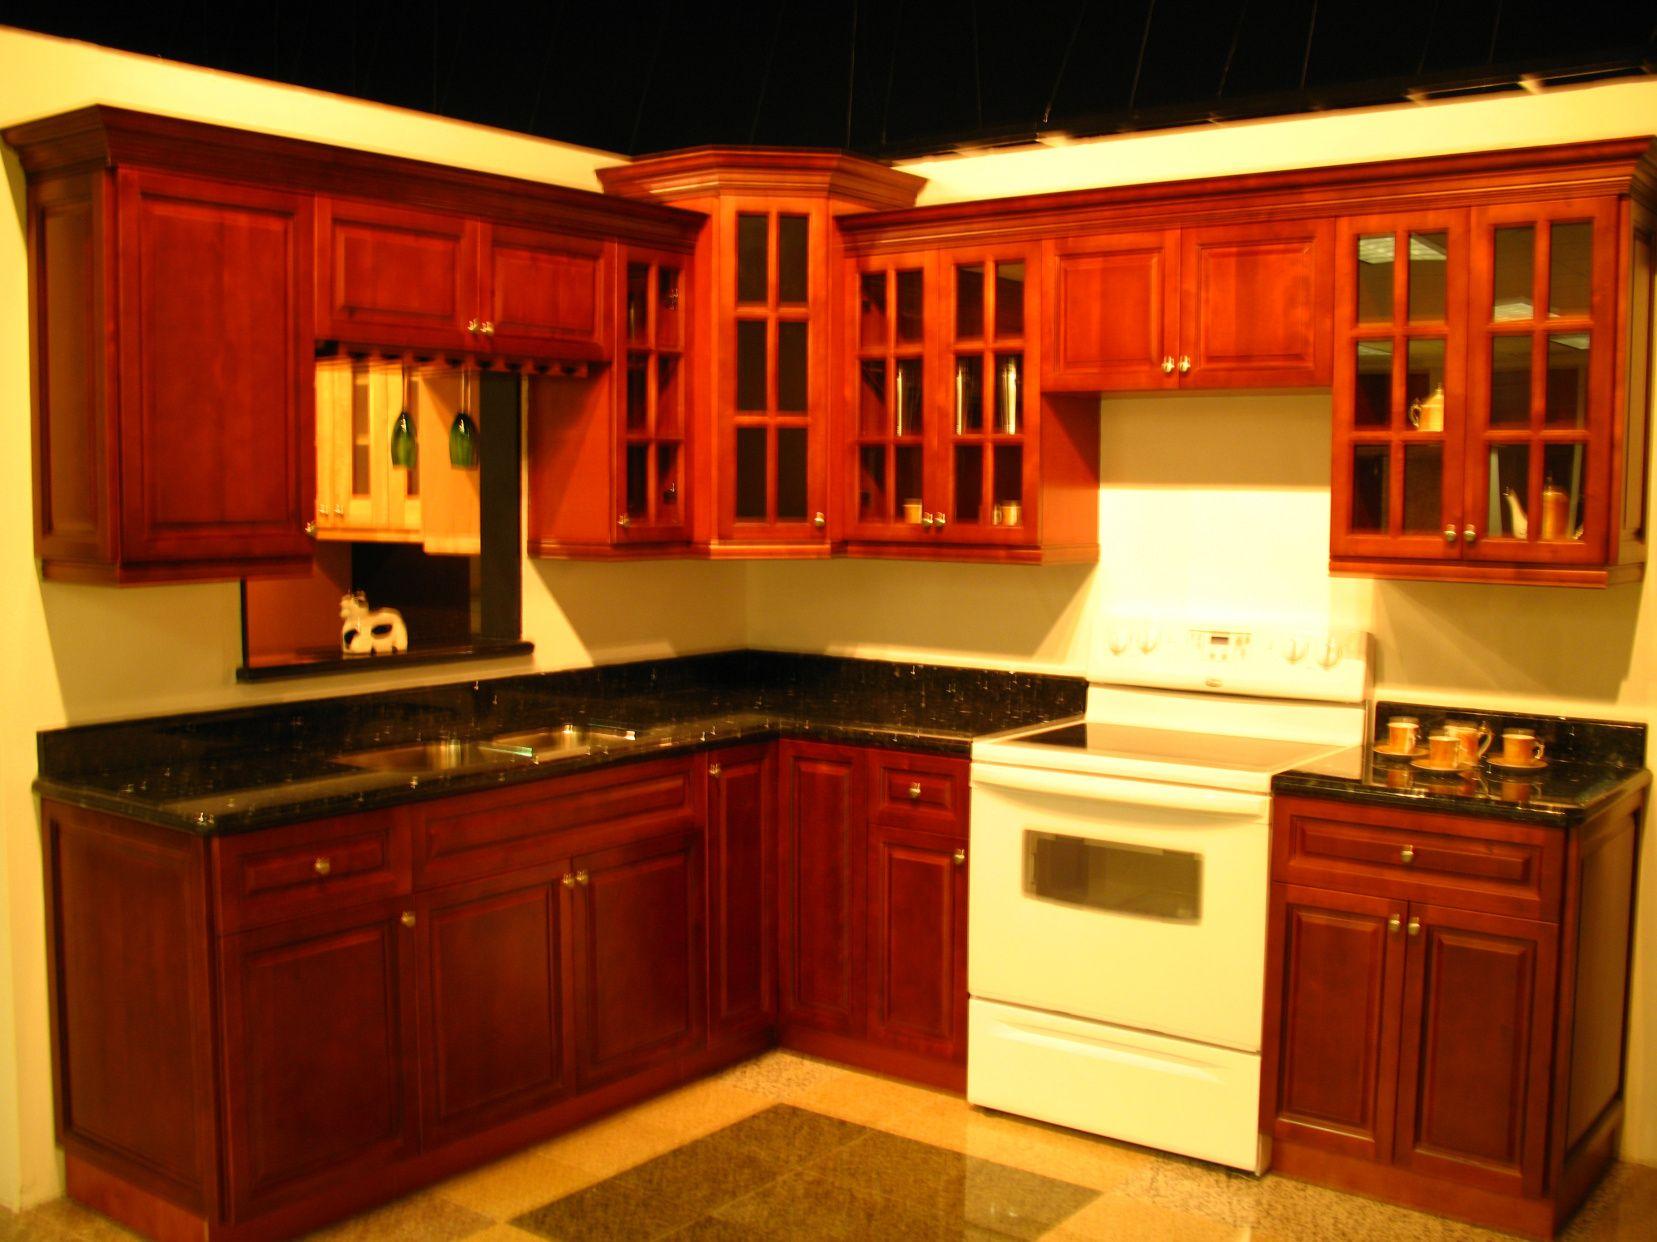 55 Granite Countertops Pompano Beach Best Kitchen Cabinet Ideas Check More At Http